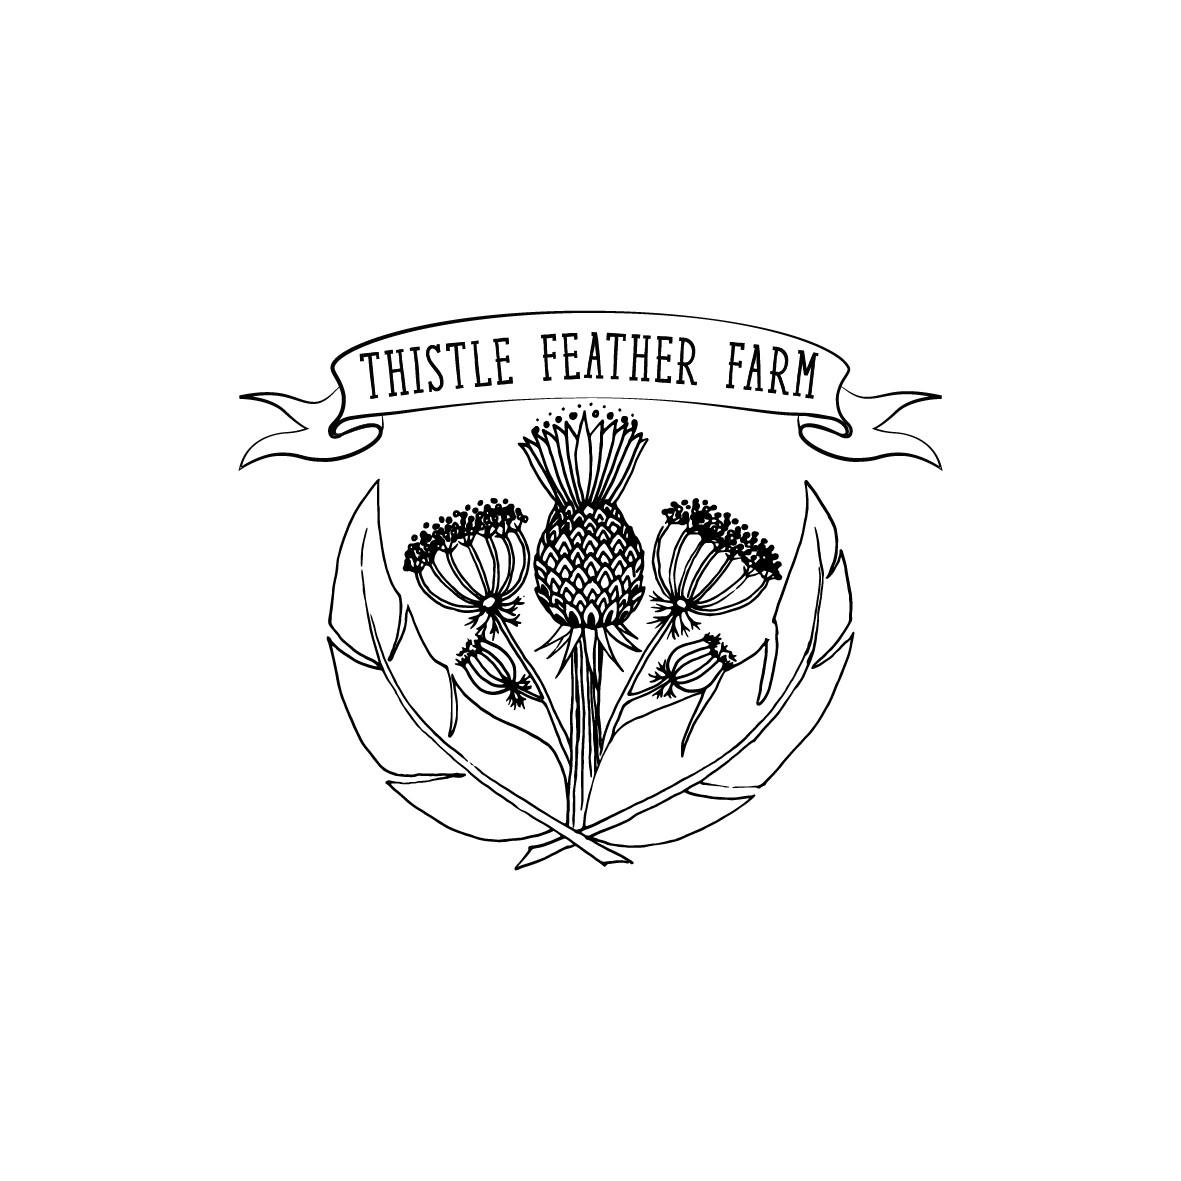 LOGO NINJA NEEDED FOR THISTLE FEATHER FARM!!!